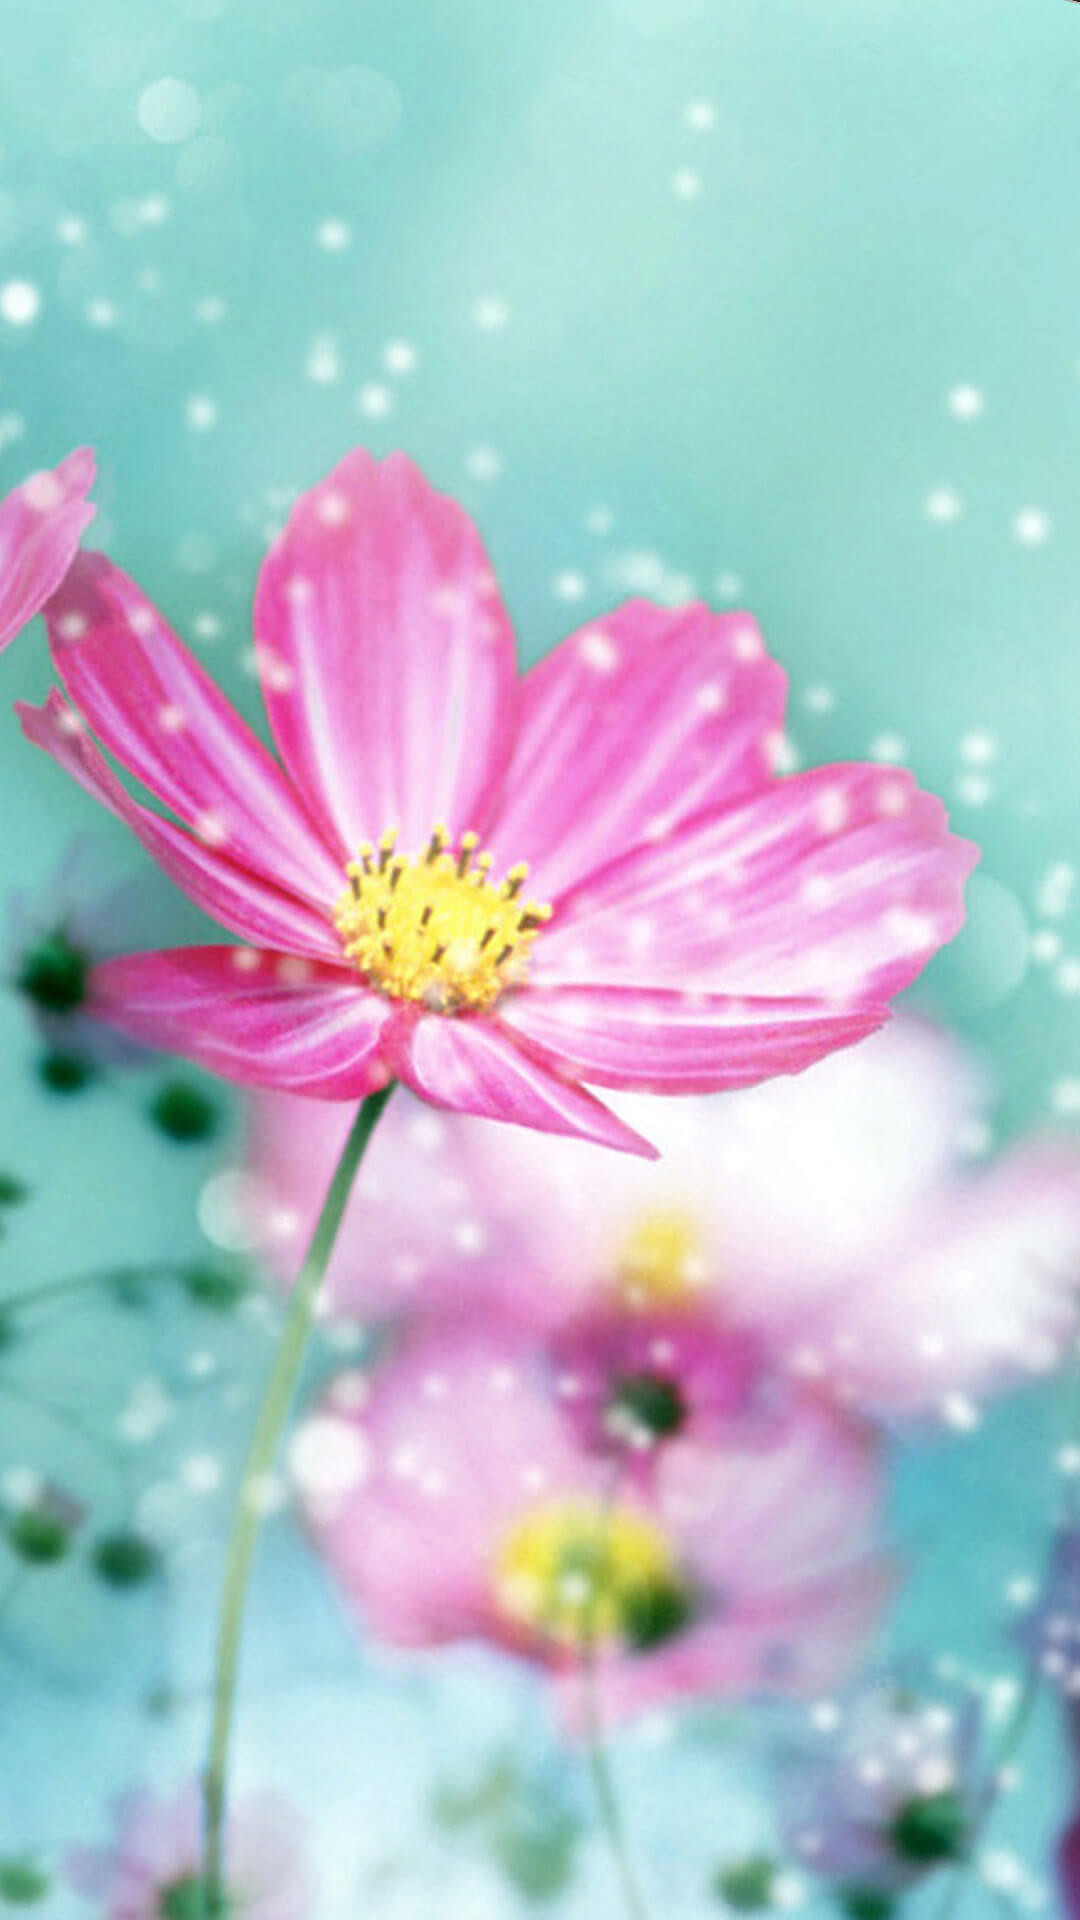 Spring Flower Iphone 6 Wallpaper Hd - Spring Flowers Wallpaper For Iphone , HD Wallpaper & Backgrounds